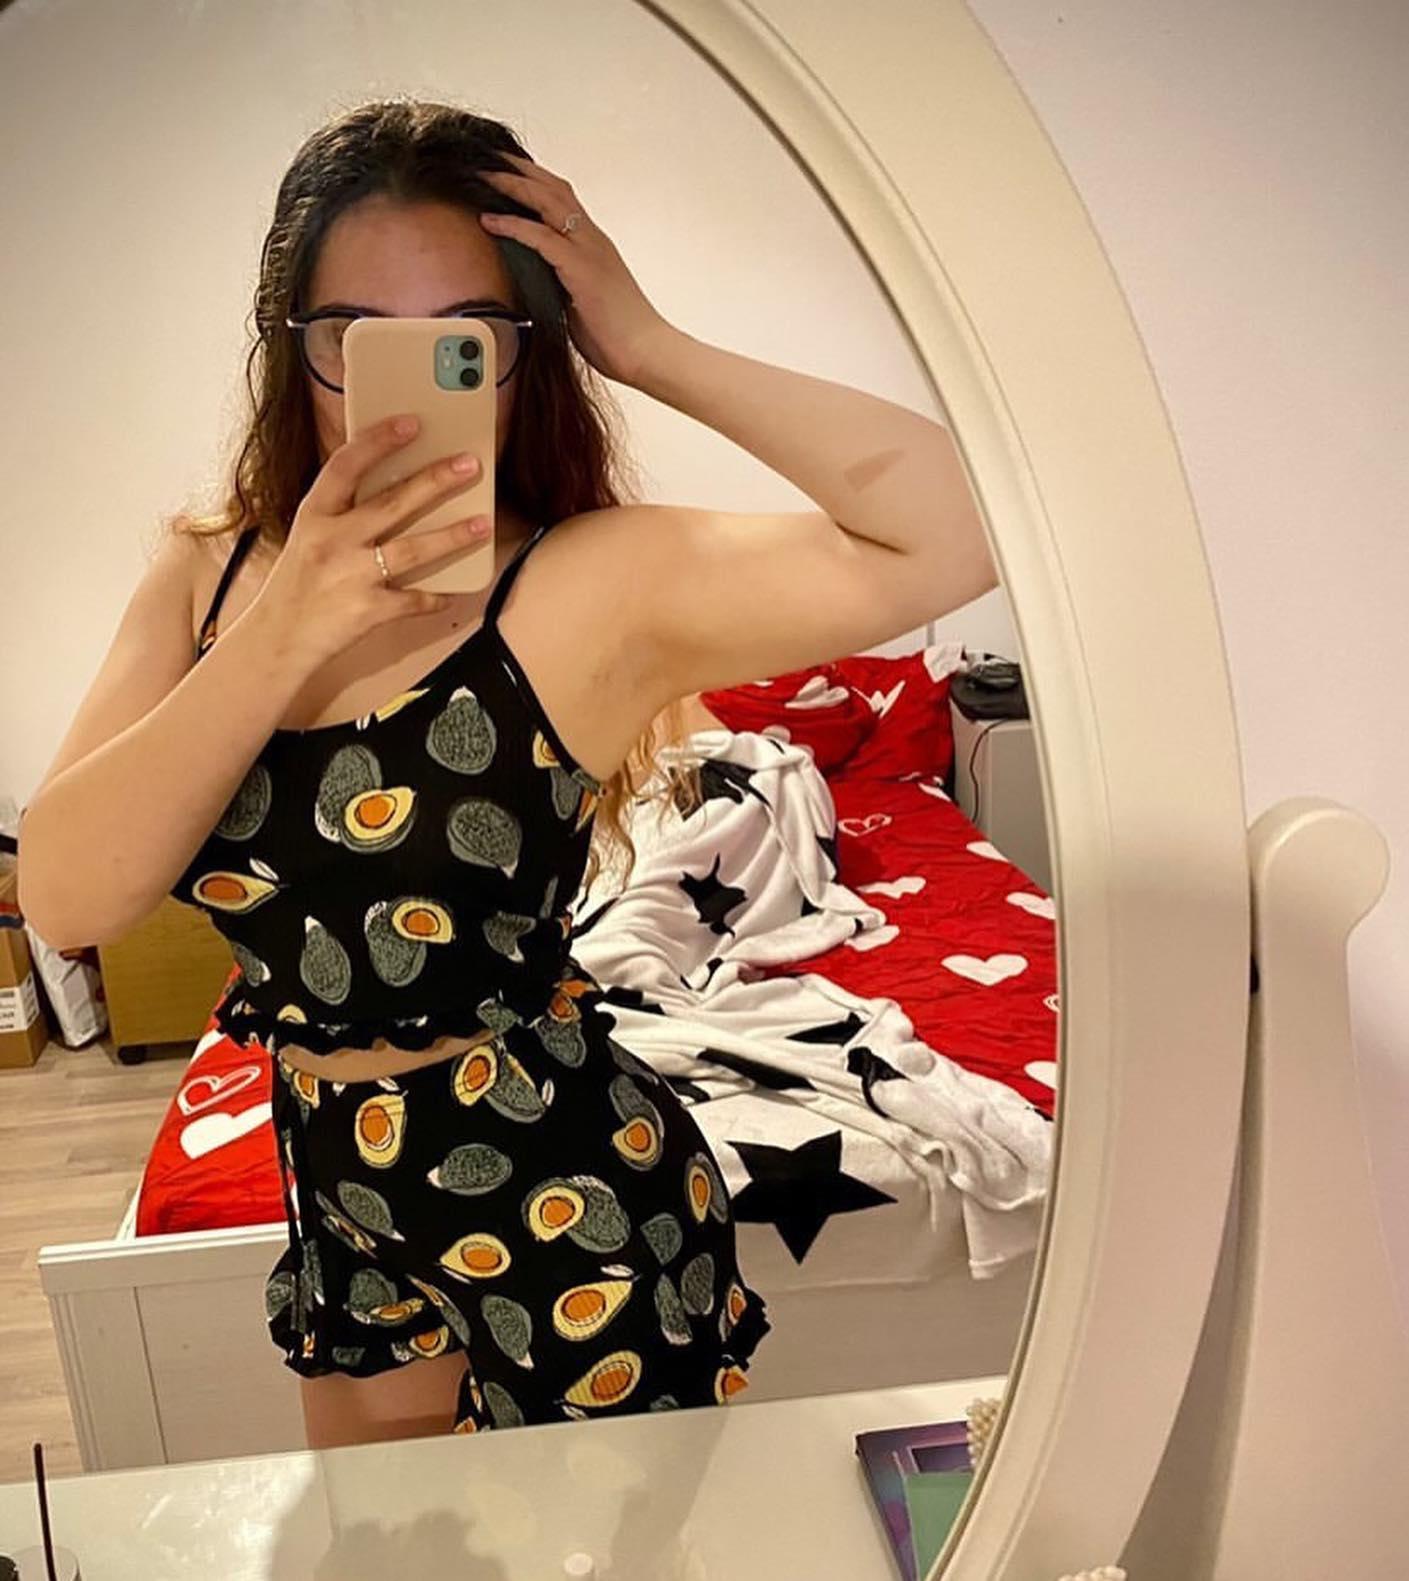 @oana_lorena27 si-a luat deja pijamalele scurte pentru noul sezon, a ales imprimeul cu avocado si animal print 🤗🌺 You look so awesome! #clothes #pajamas #photooftheday #summer #sunnyday #instadaily #colour #spring